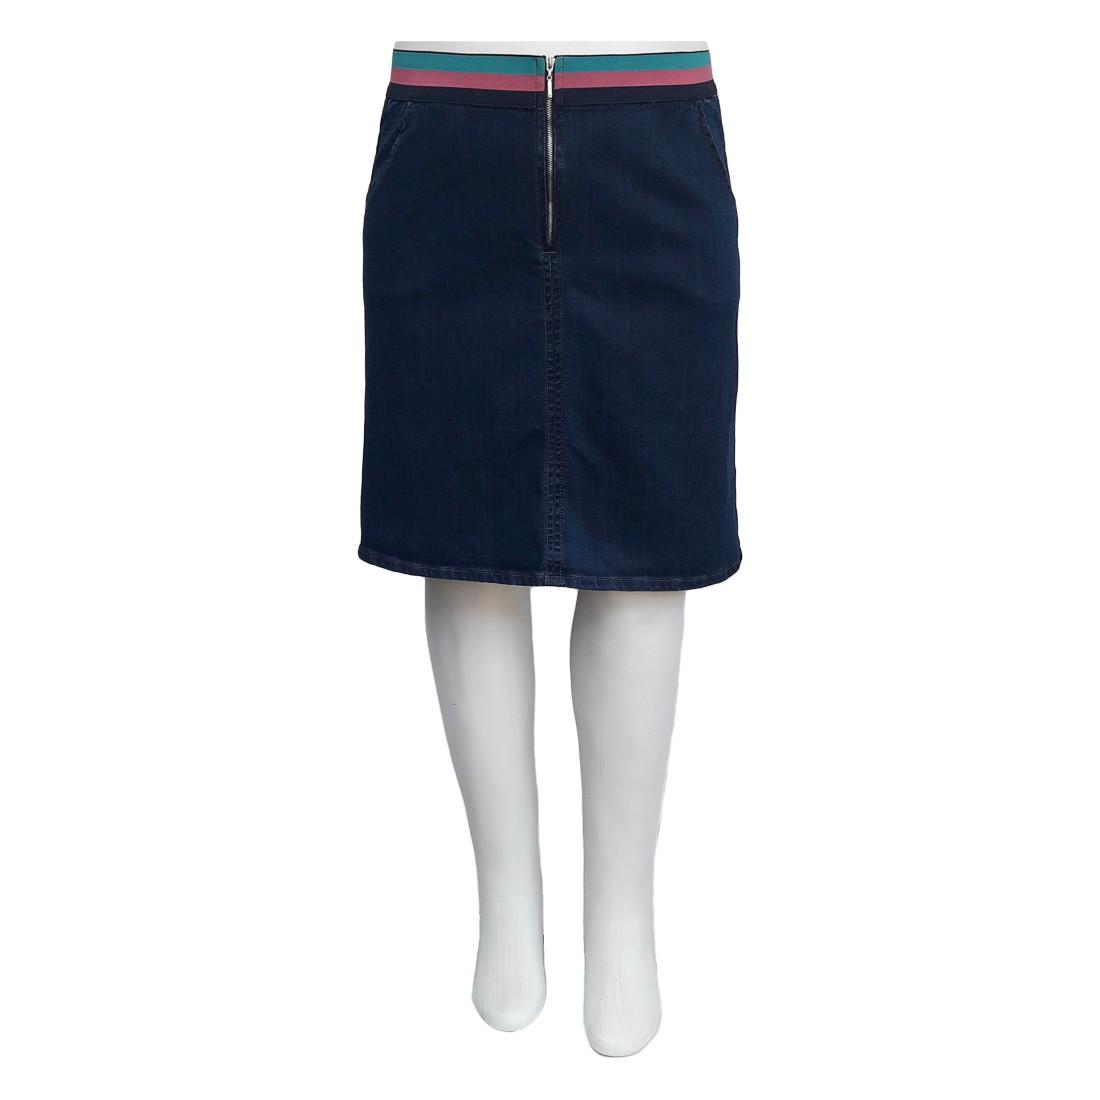 Saia Jeans Plus Size Elástico Color Moda Evangélica